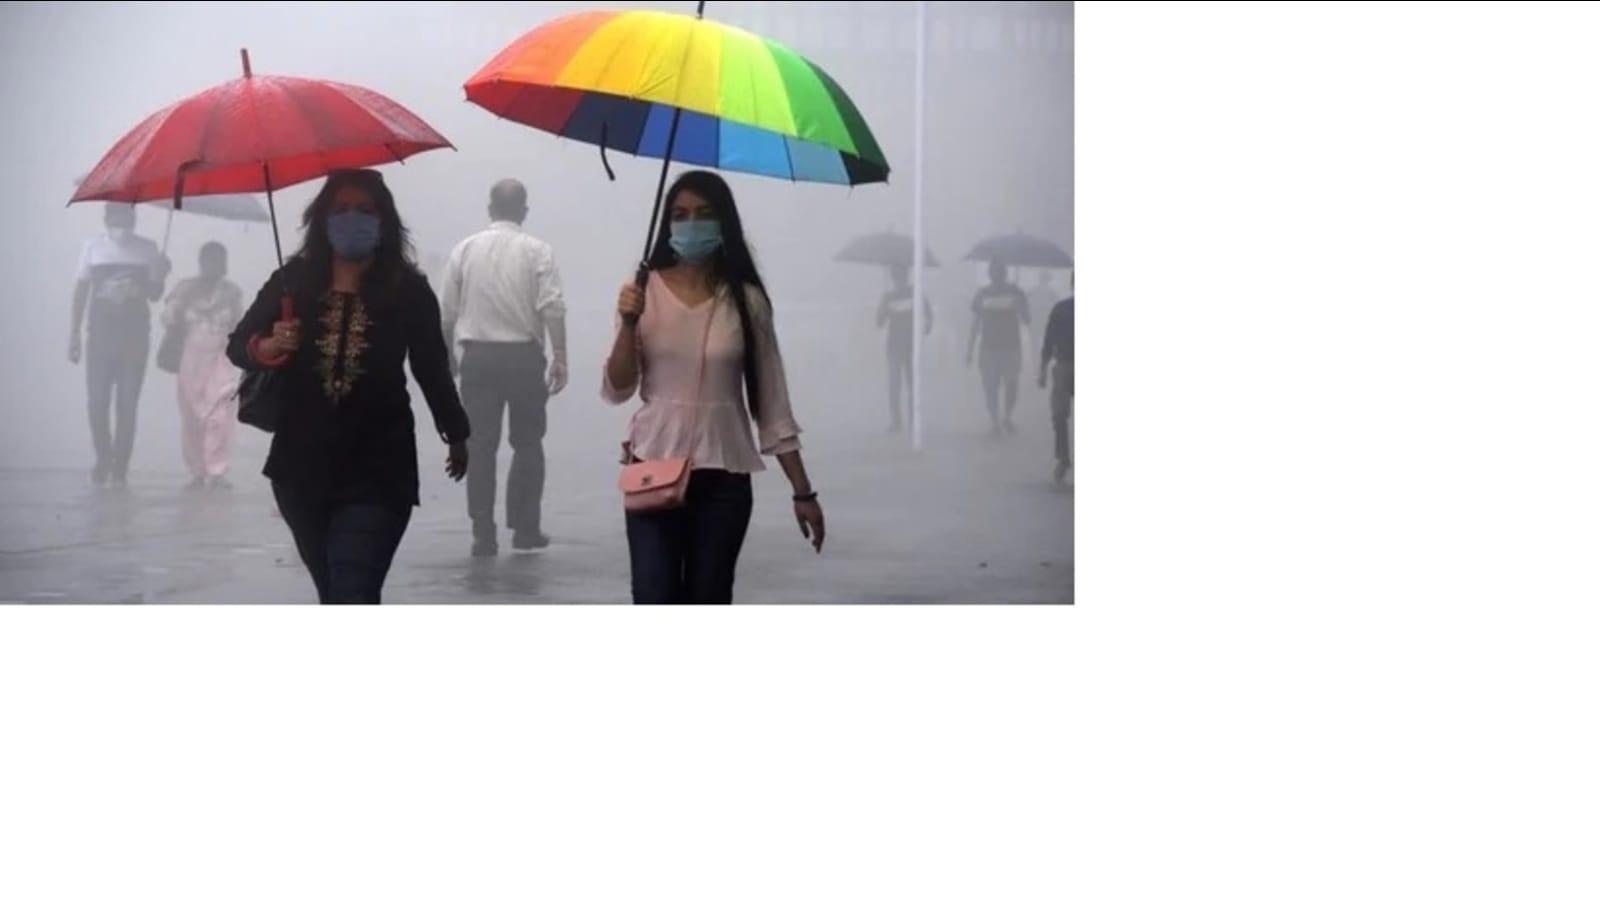 Heavy rain across Uttar Pradesh; more likely, says weatherman